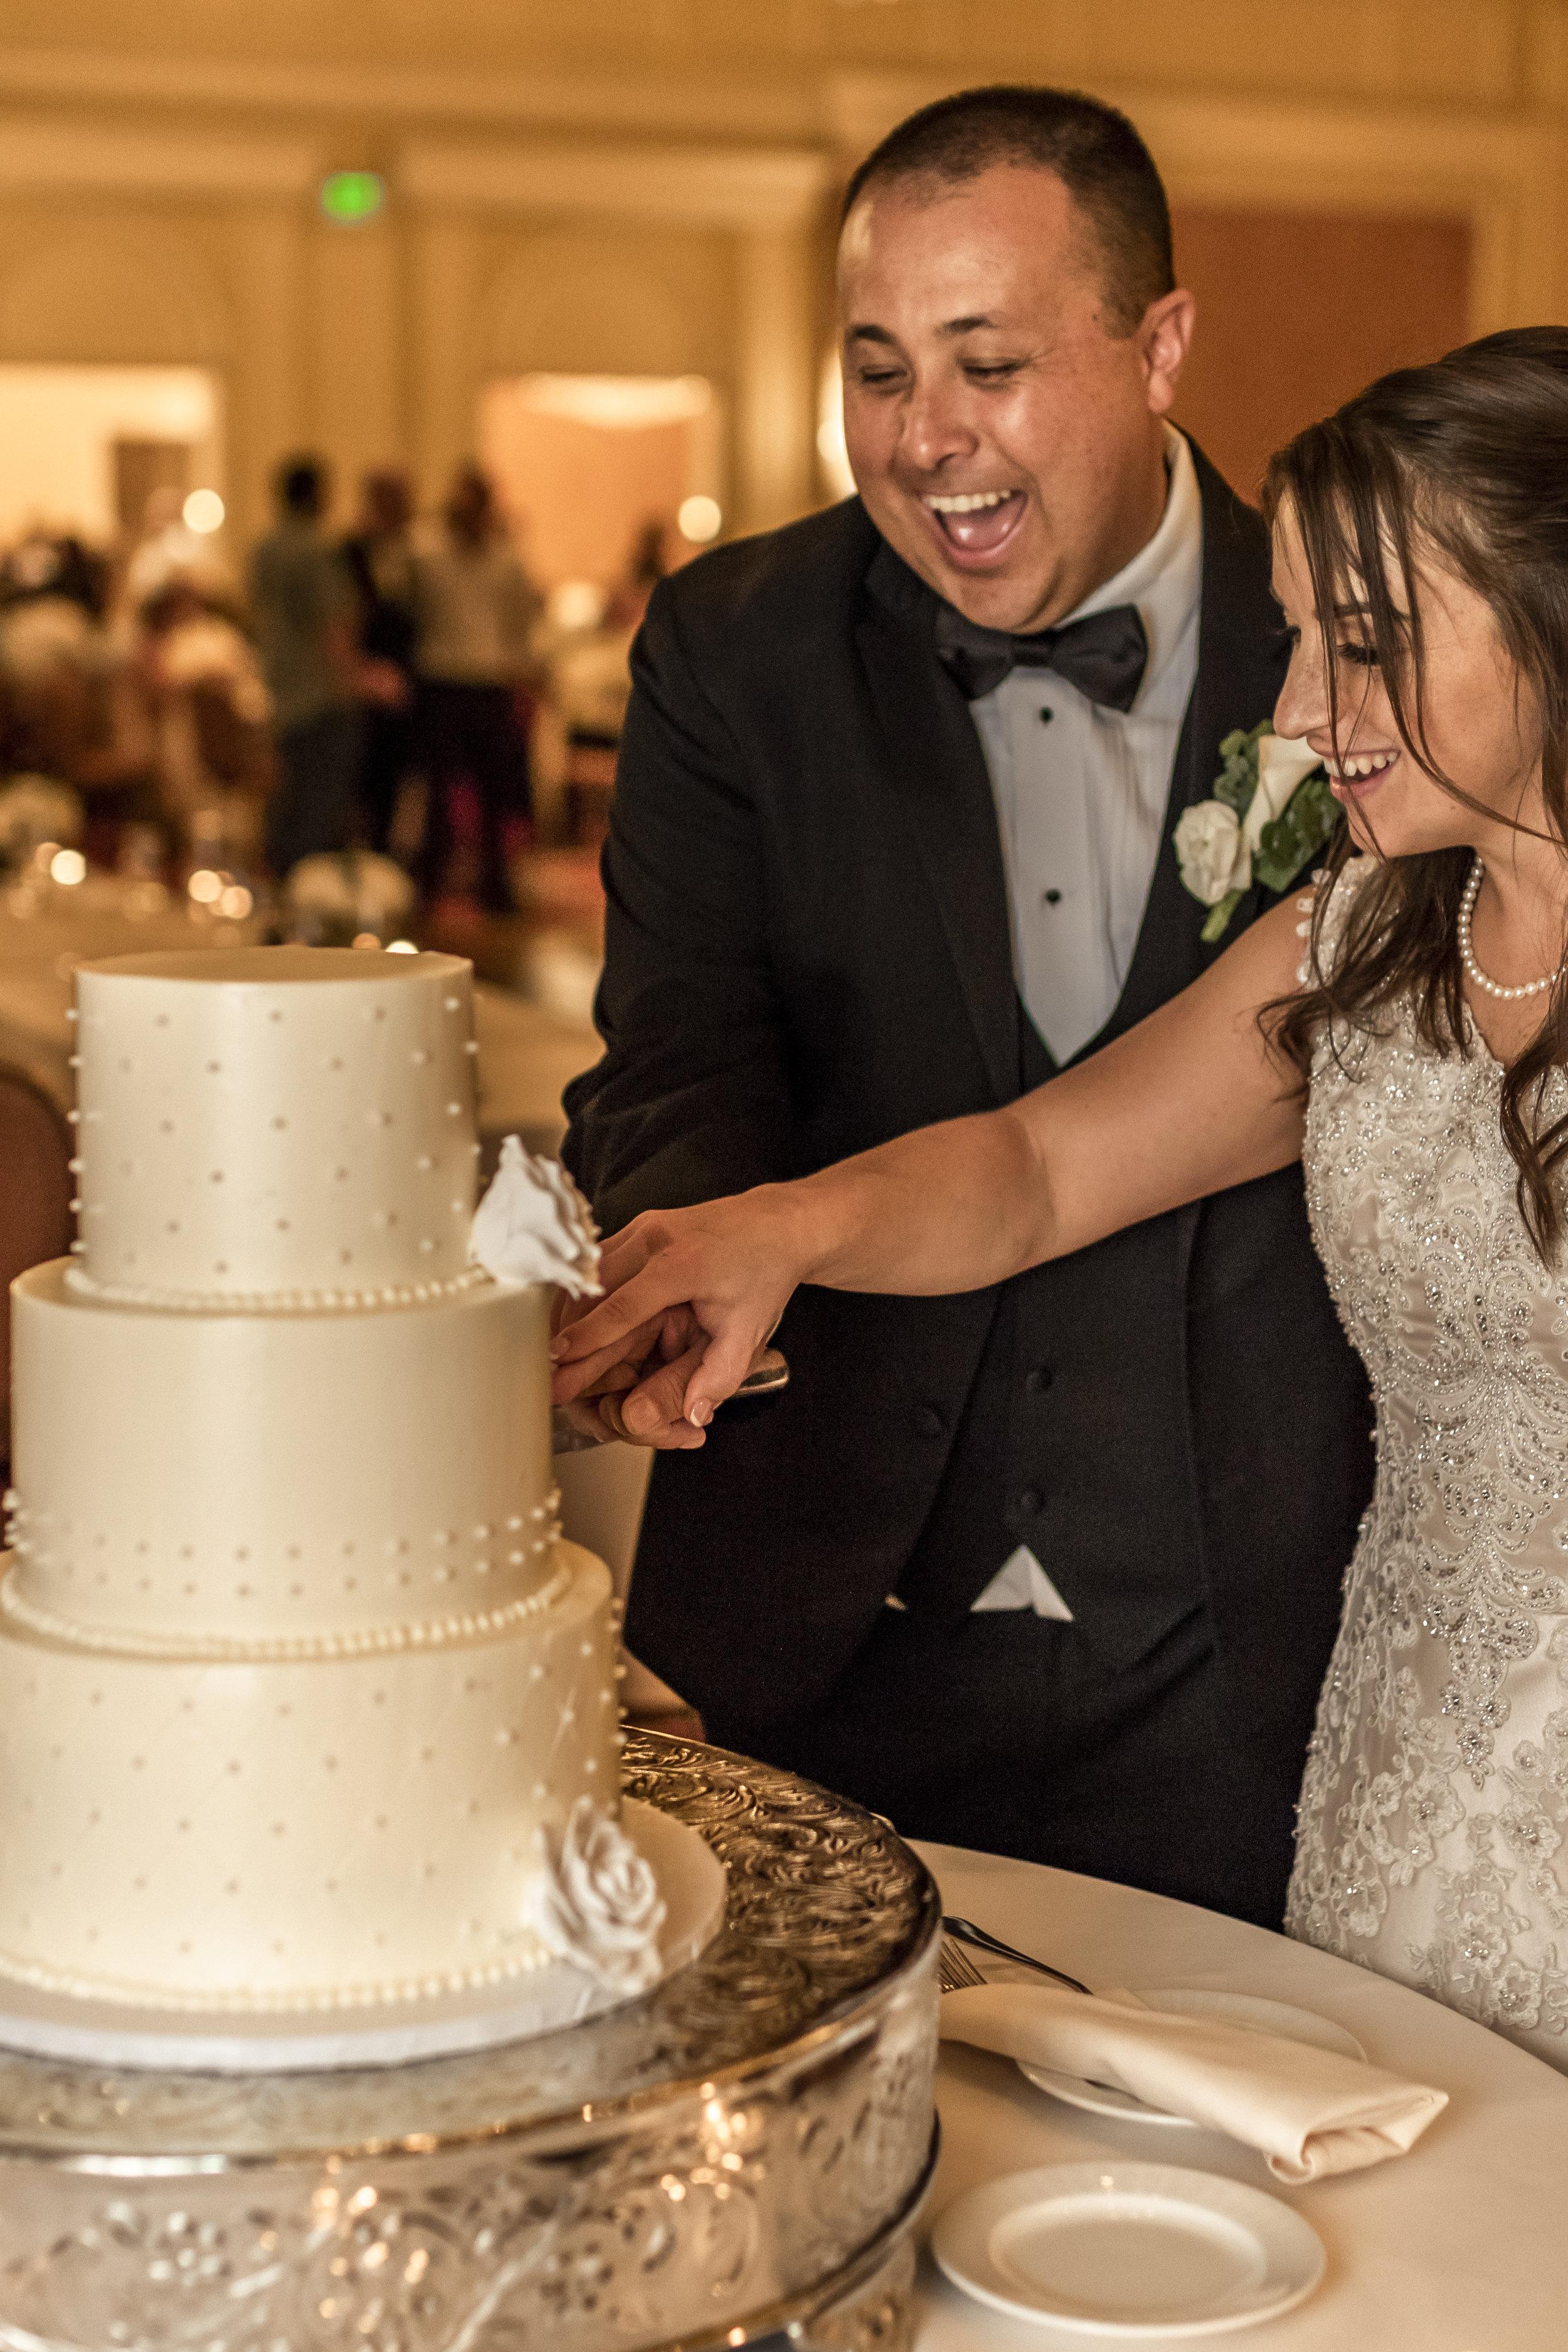 Grand America Hotel High End Wedding  Salt Lake City, Utah   Bri Bergman Photography 046.JPG